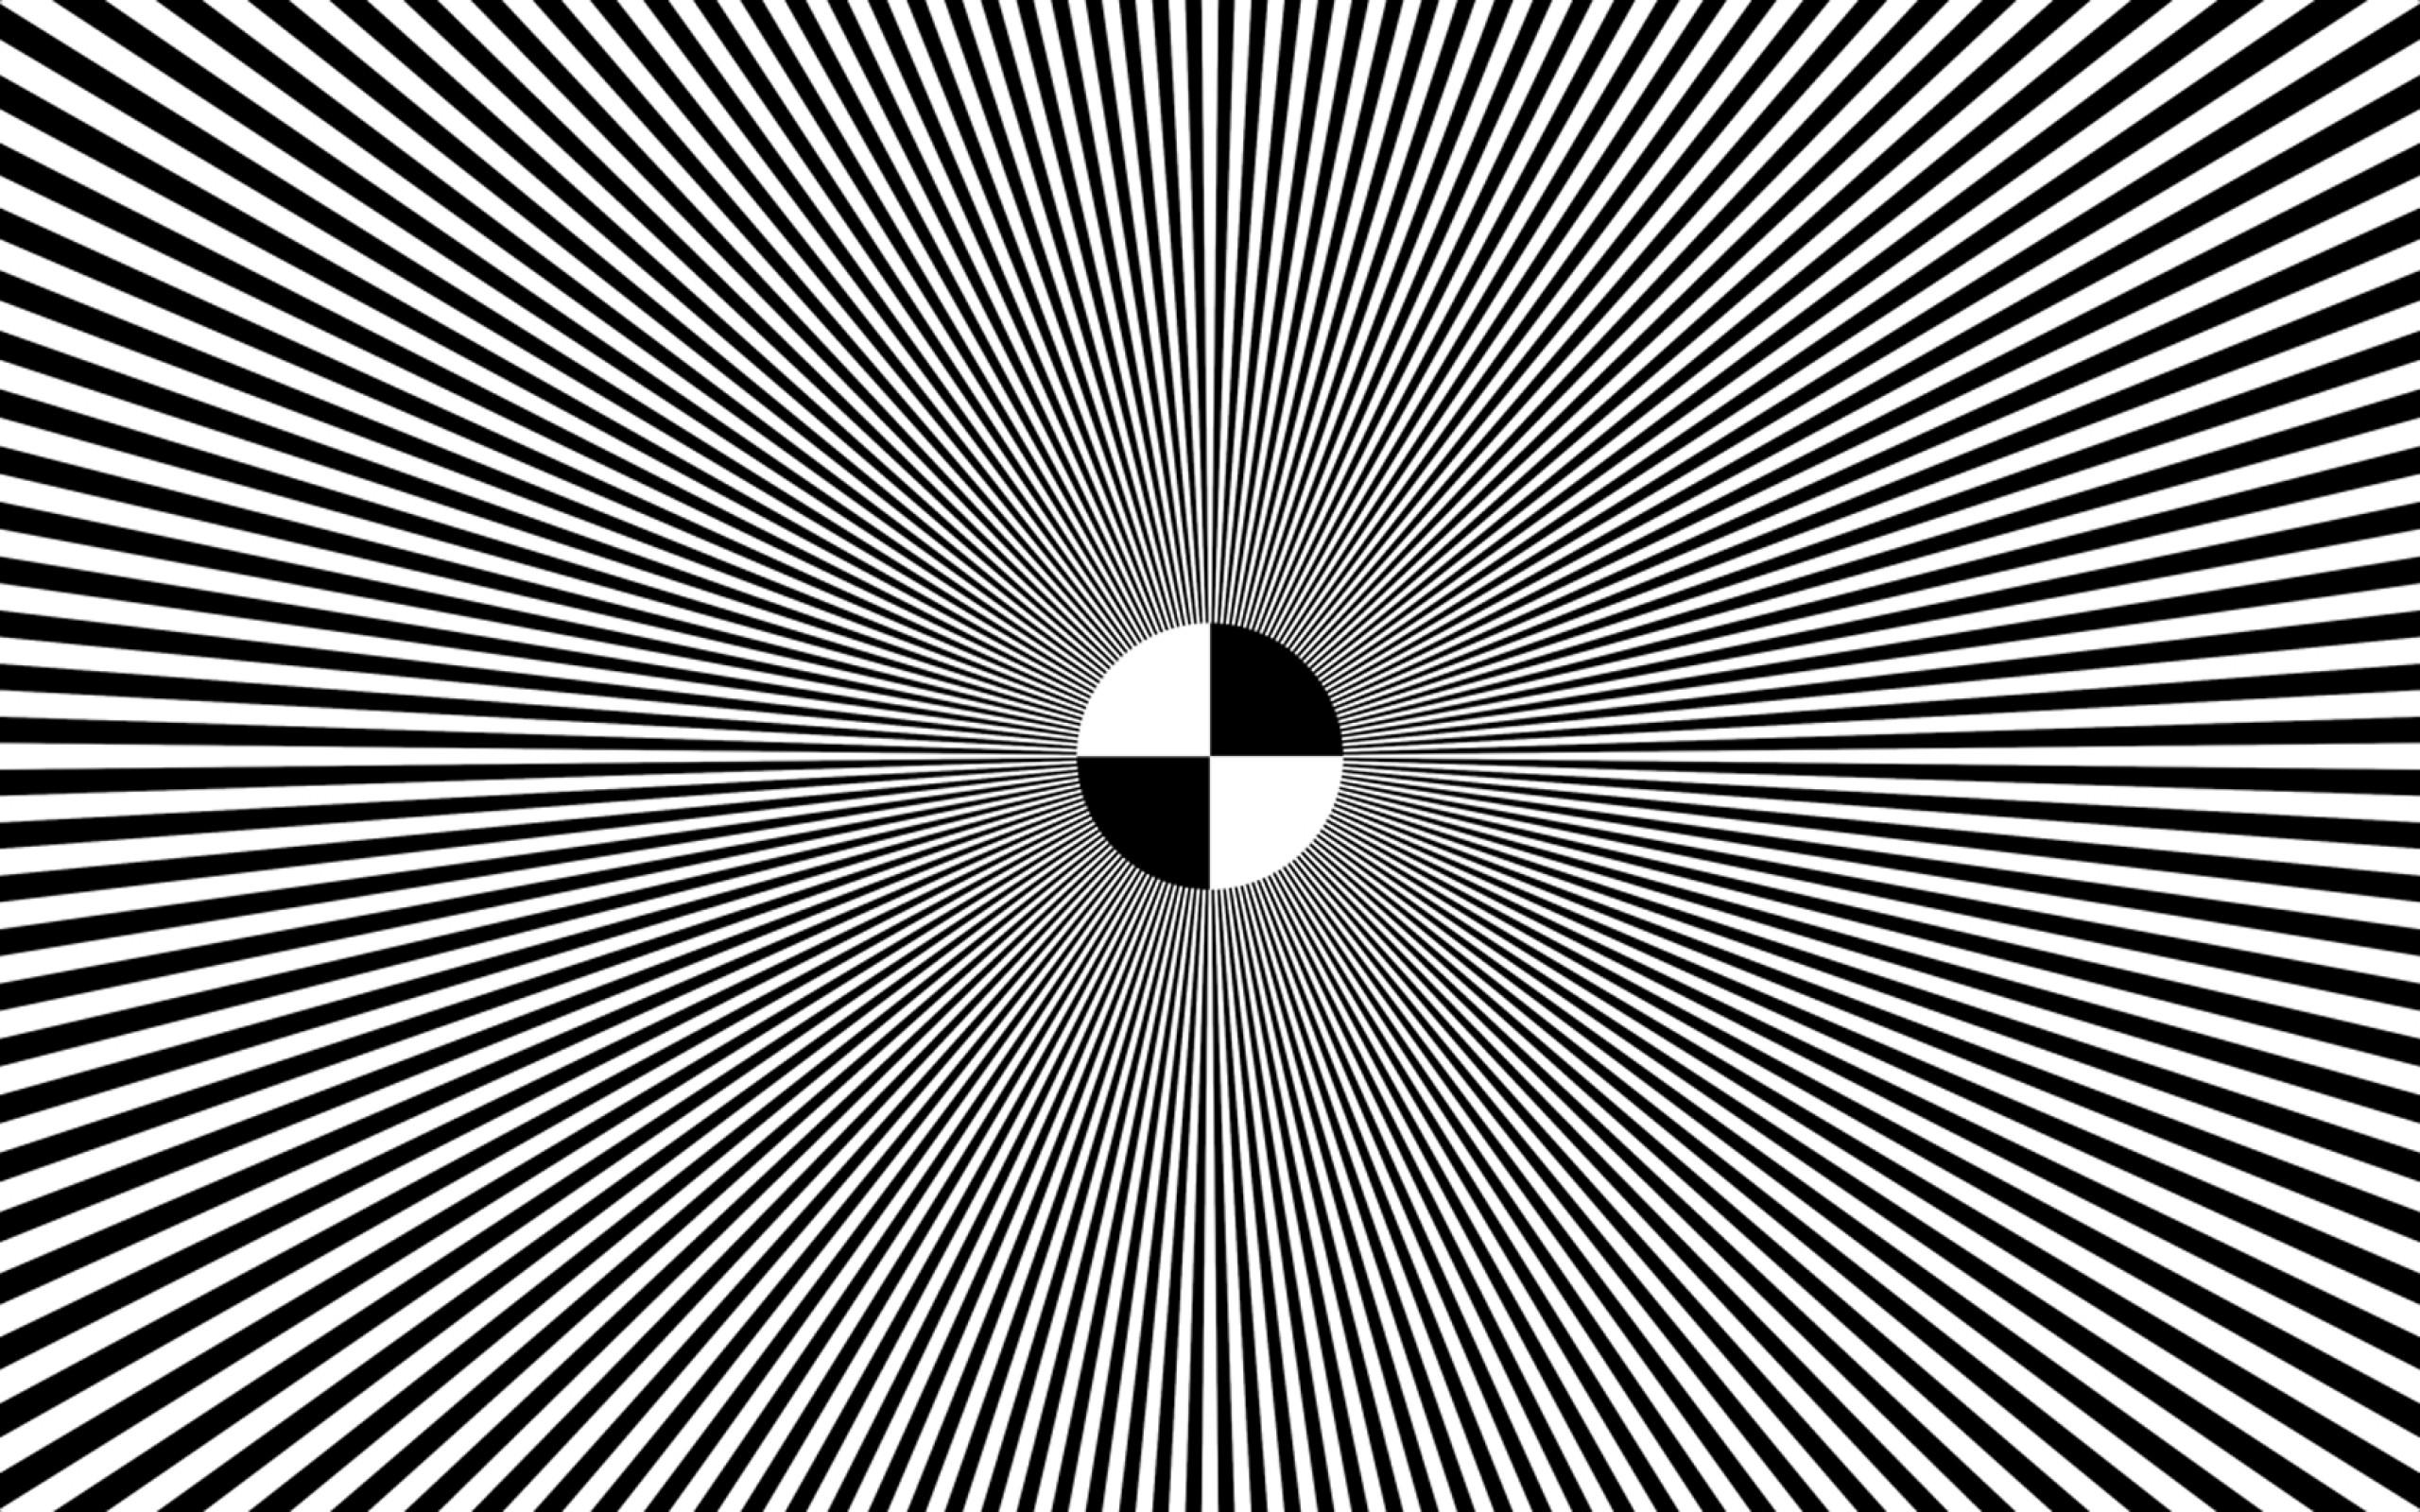 Pc Wallpaper 3d Eye Illusion 3d Illusion Wallpaper 58 Images